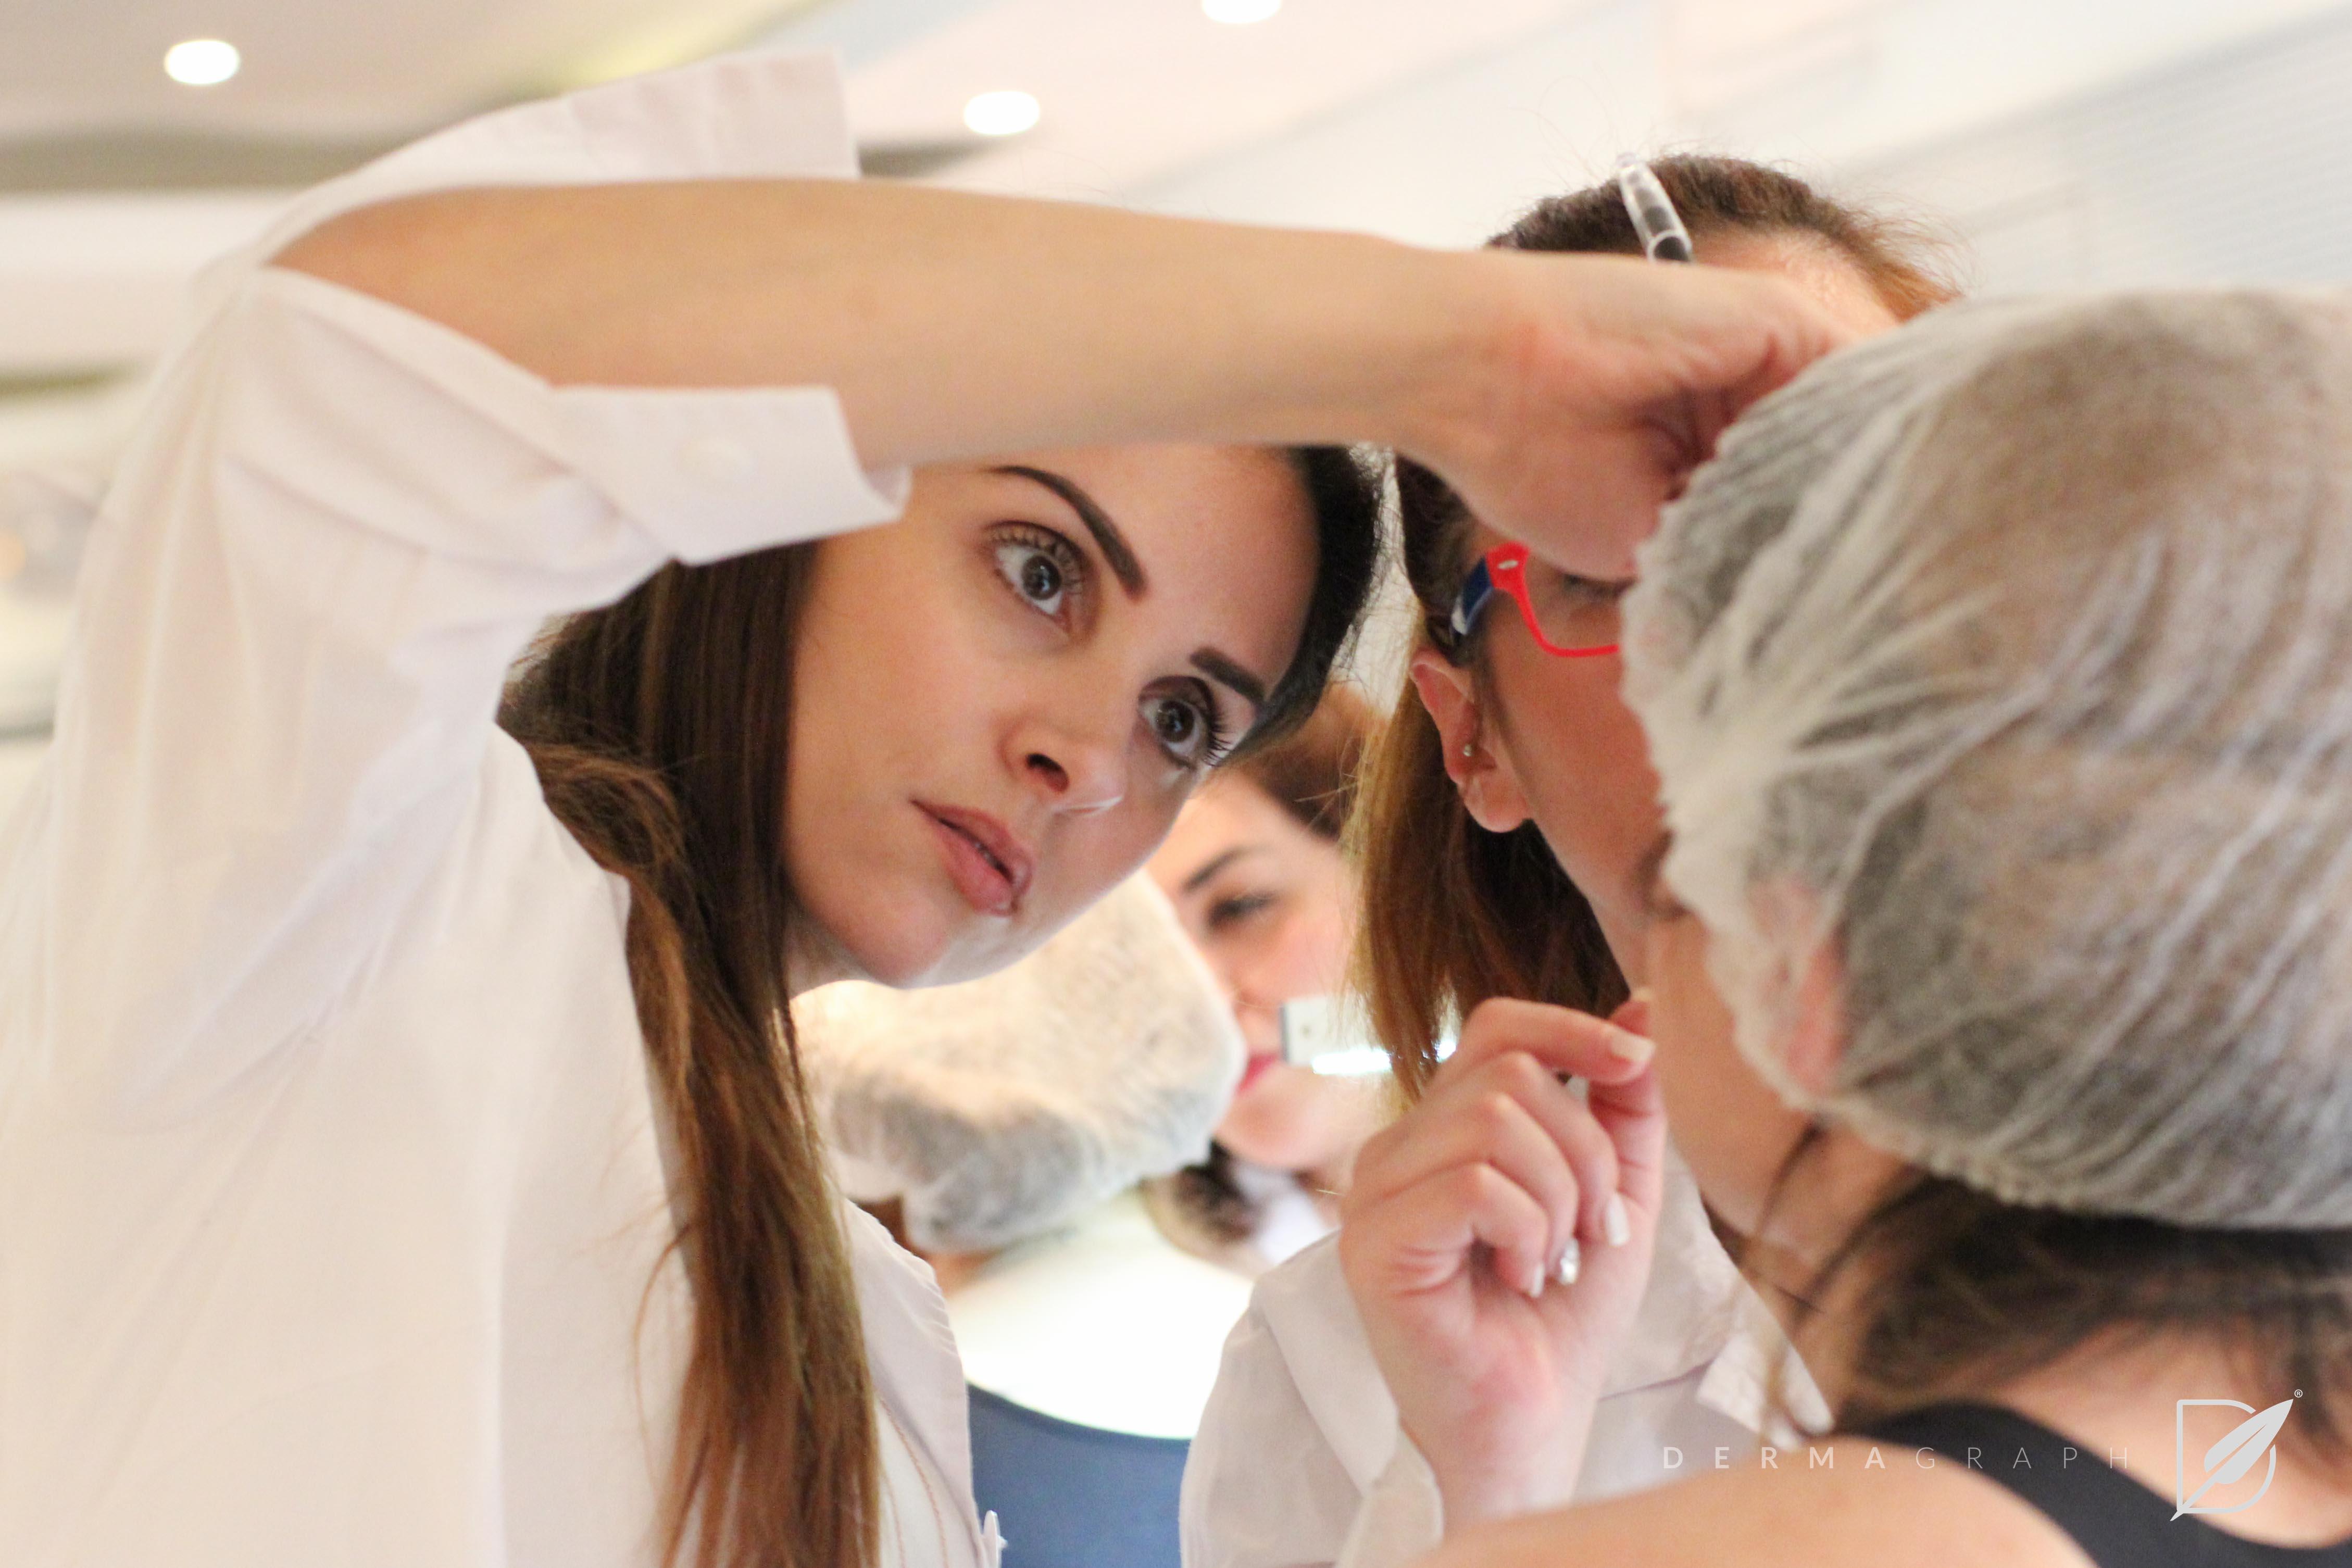 Dermagraph Permanent Makeup School